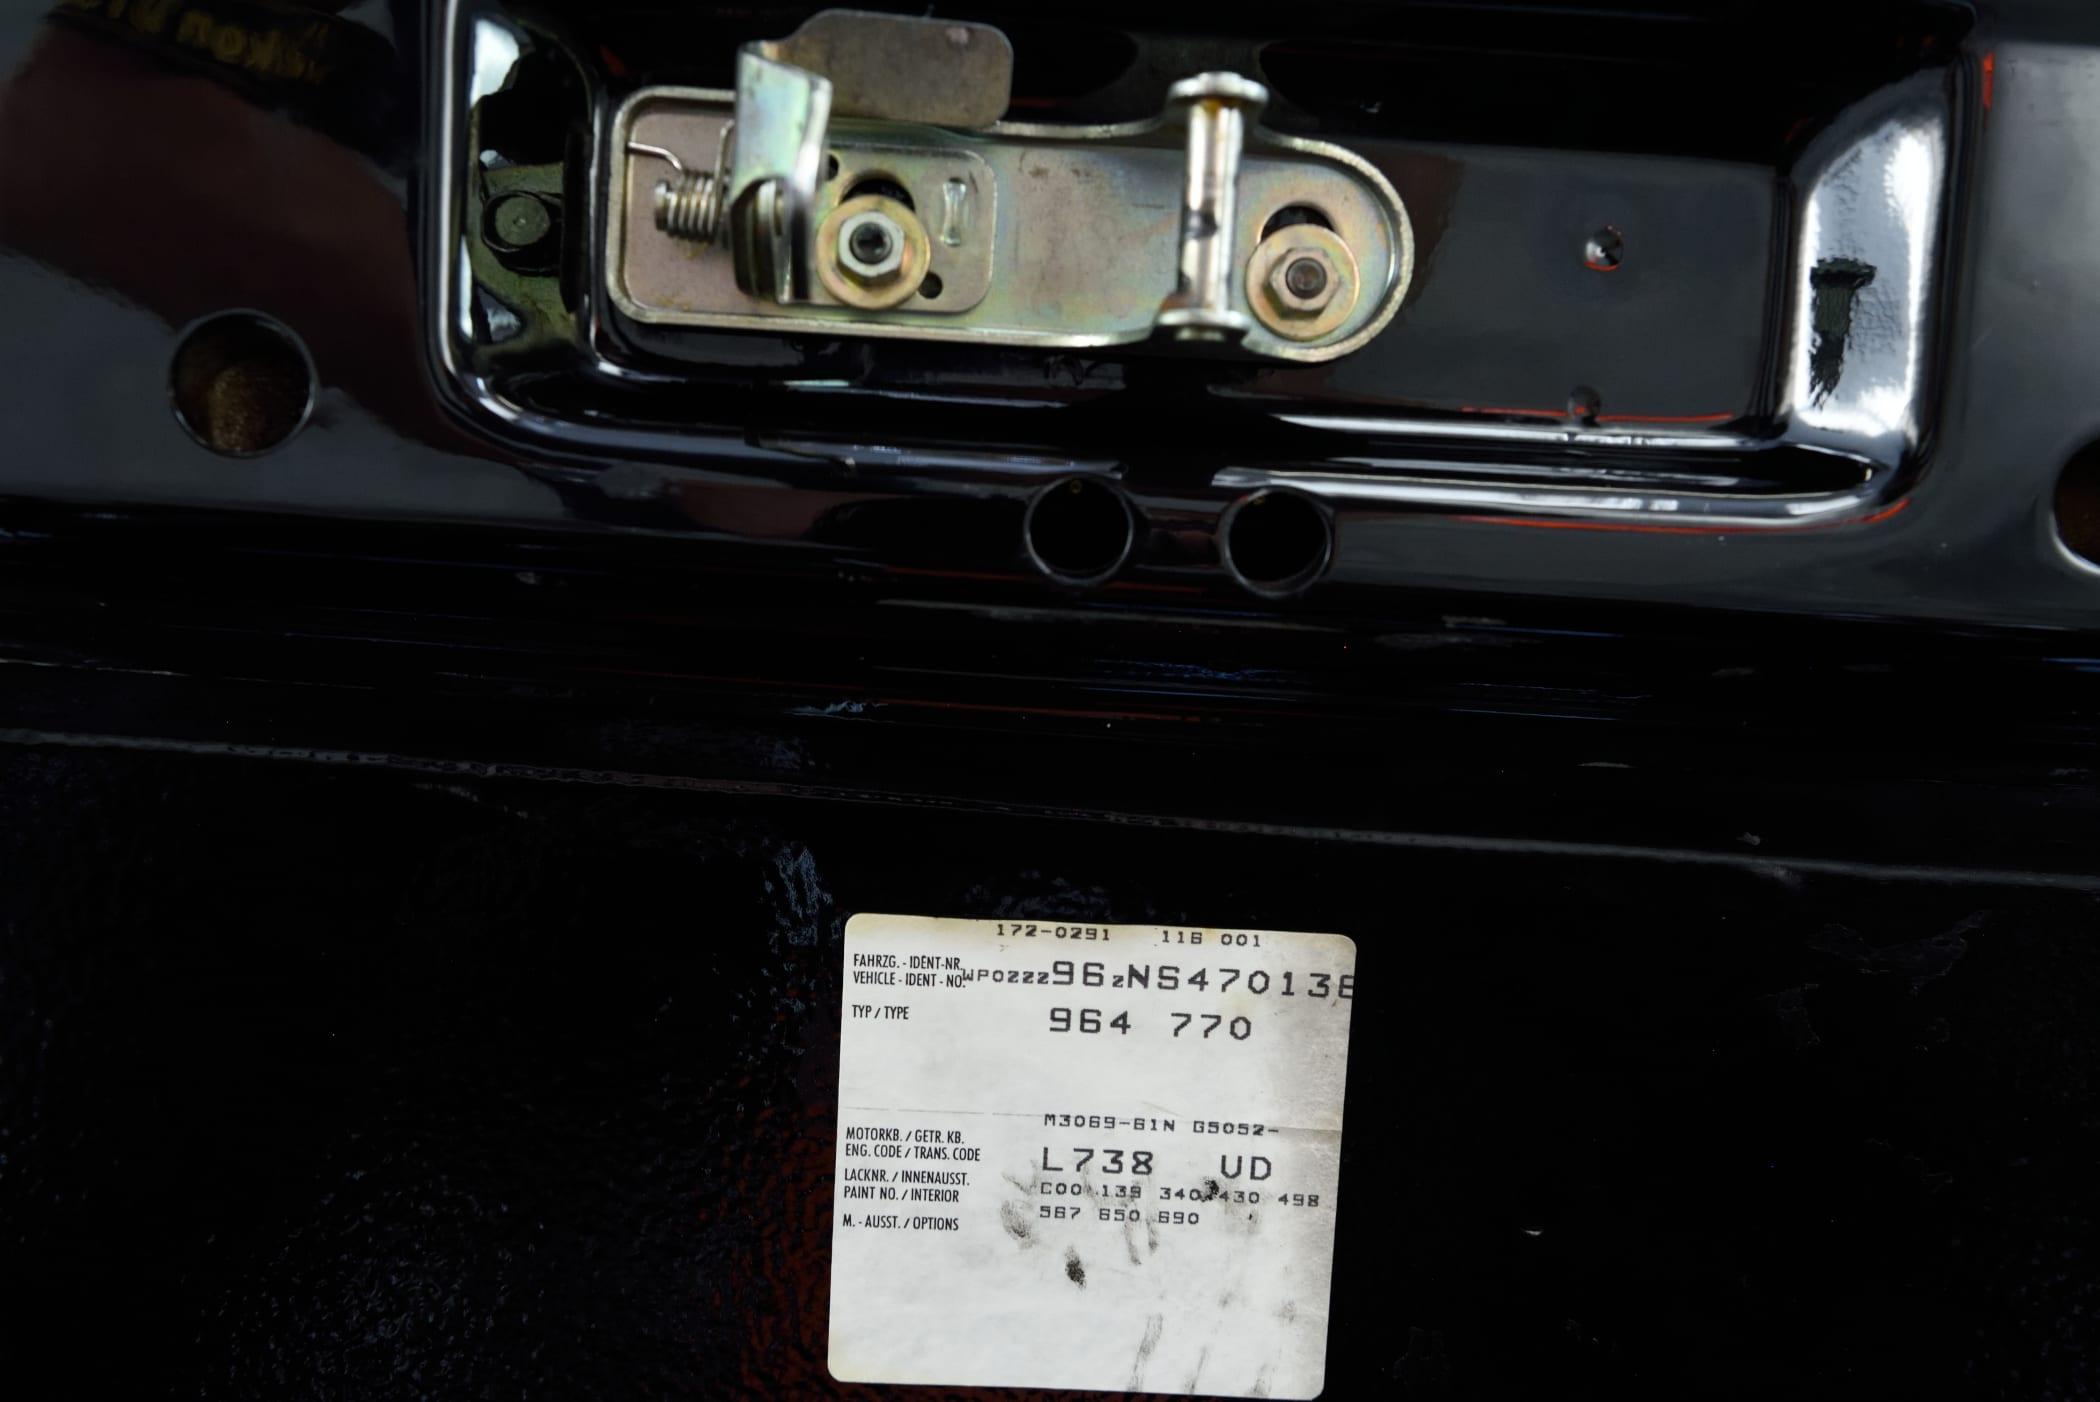 Porsche 964 Fahrzeugdatenträger